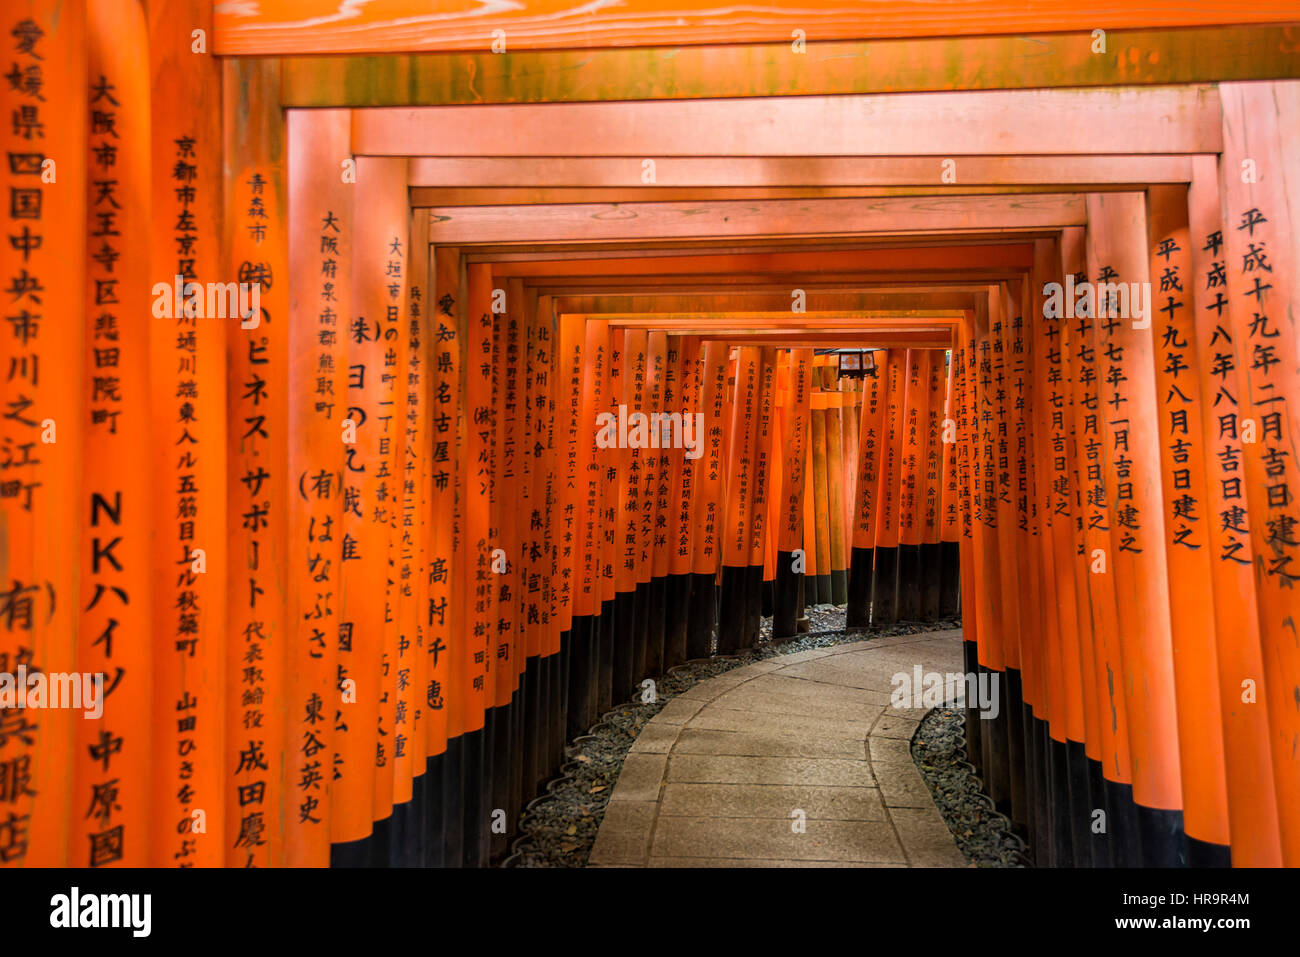 Thousands of Torii gates at Fushimi Inari Taicha, Kyoto, Japan - Stock Image